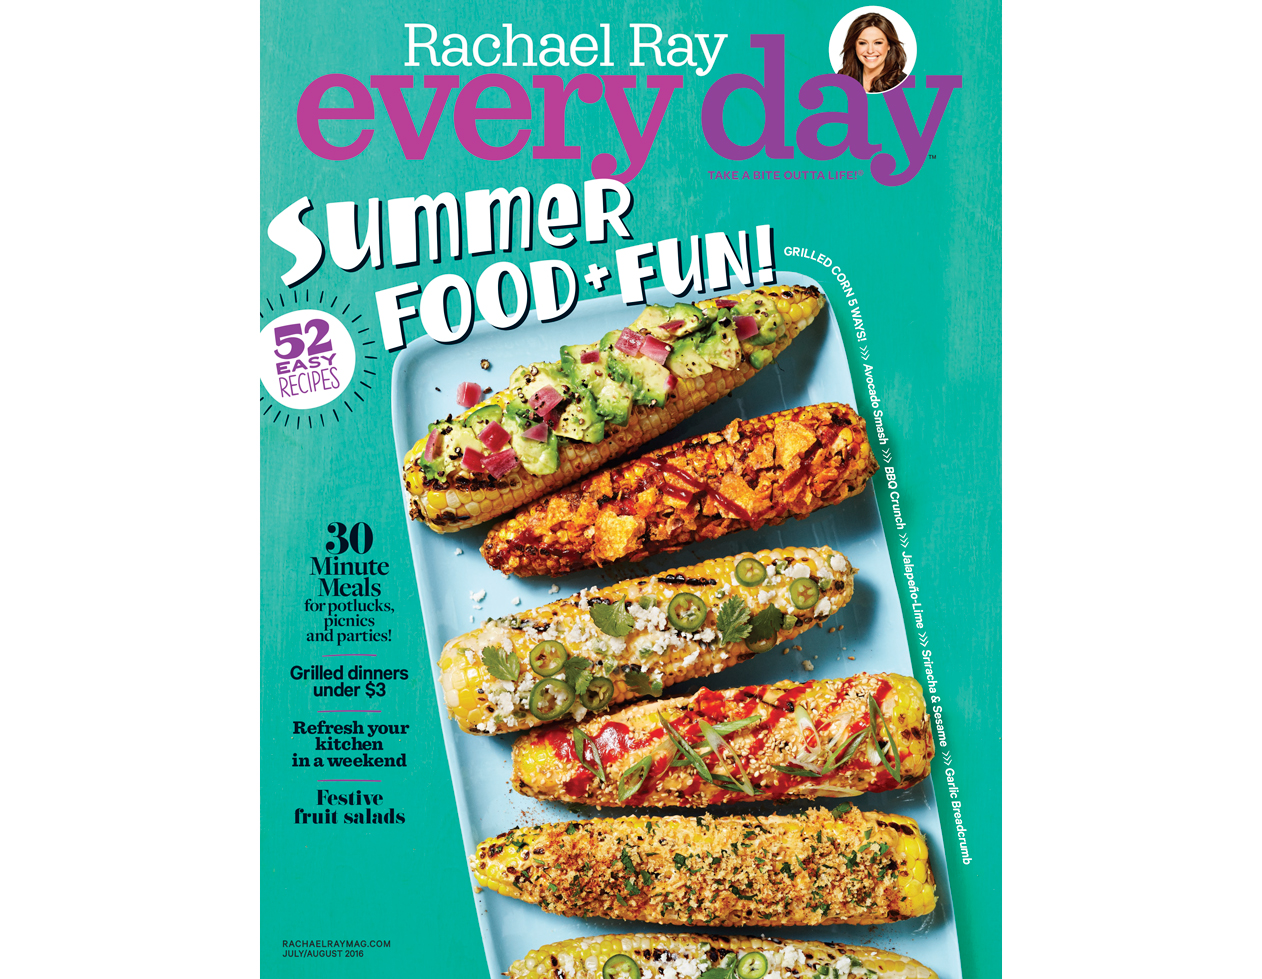 000-RachaelRayEveryDay-JulAug2016-3.jpg